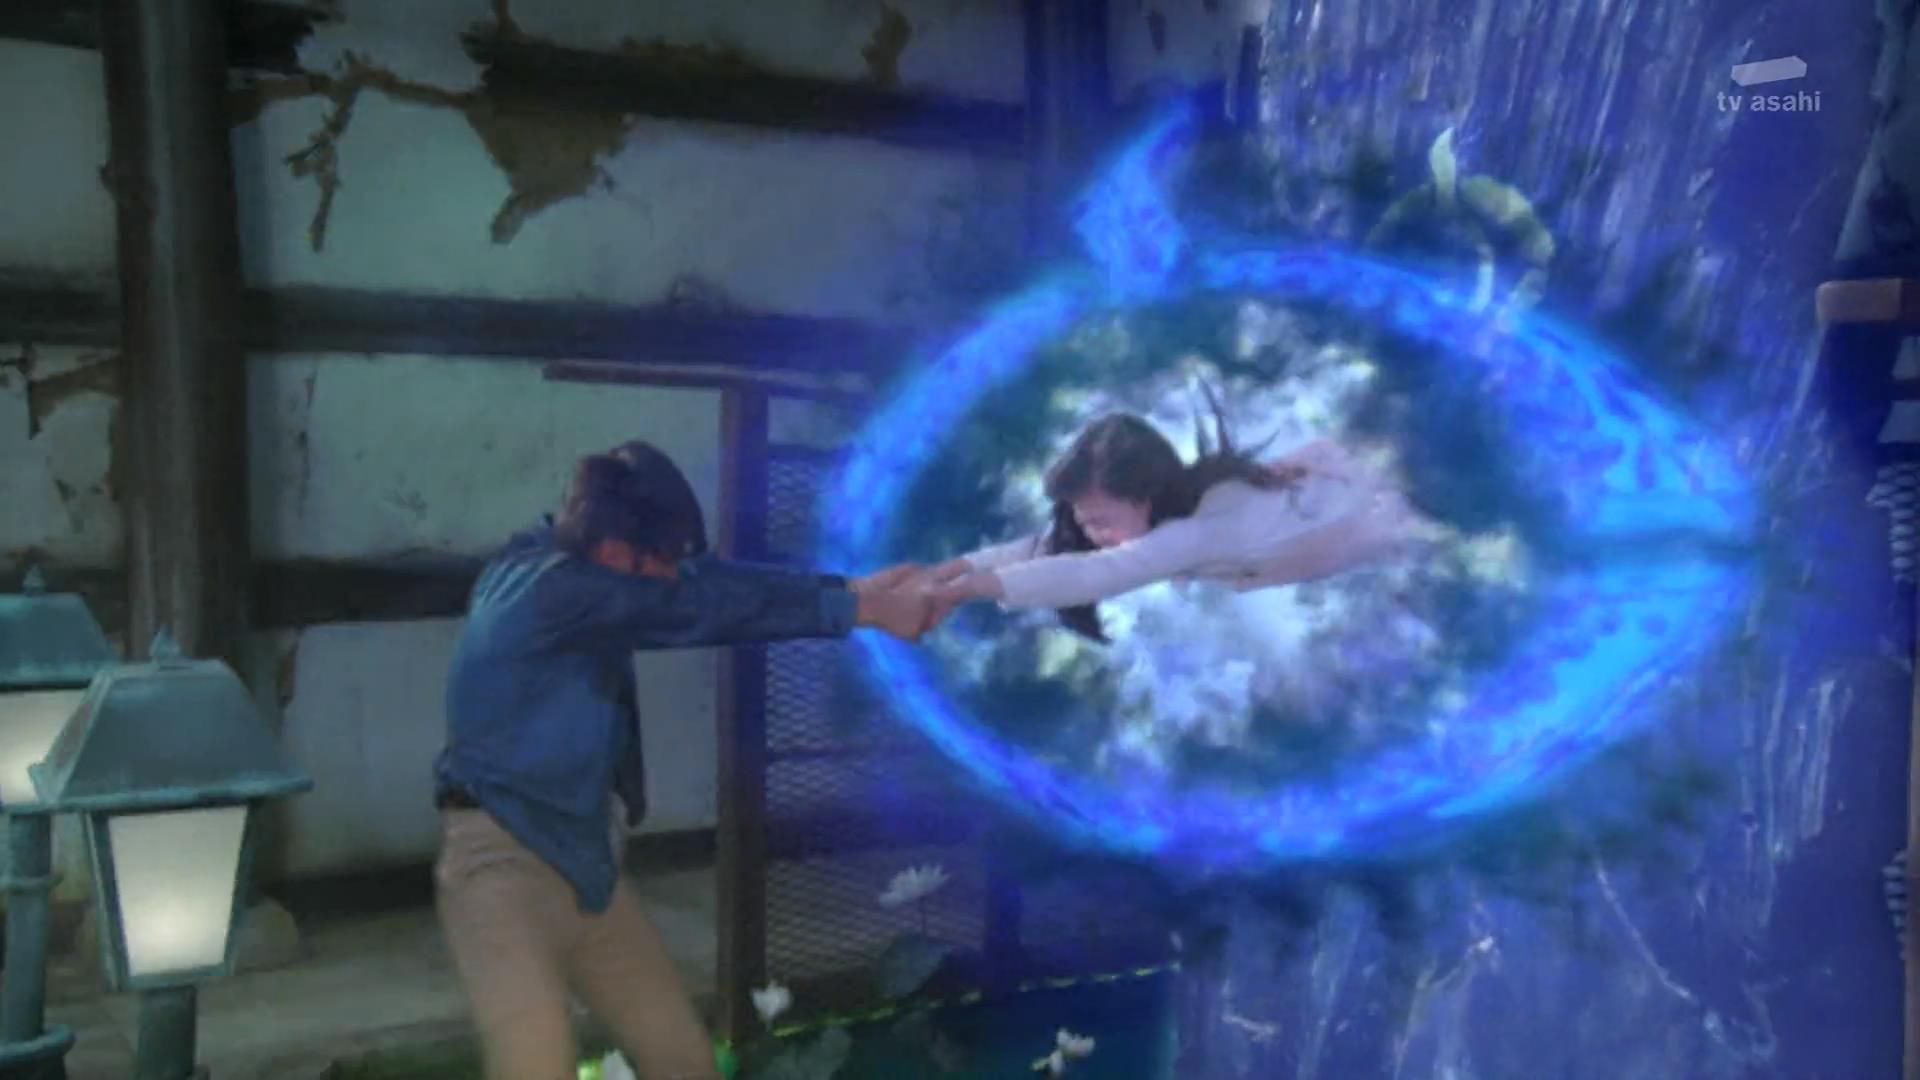 Toku Secrets Podcast: Episode 14 – Kamen Rider Ghost Episode 08 Review